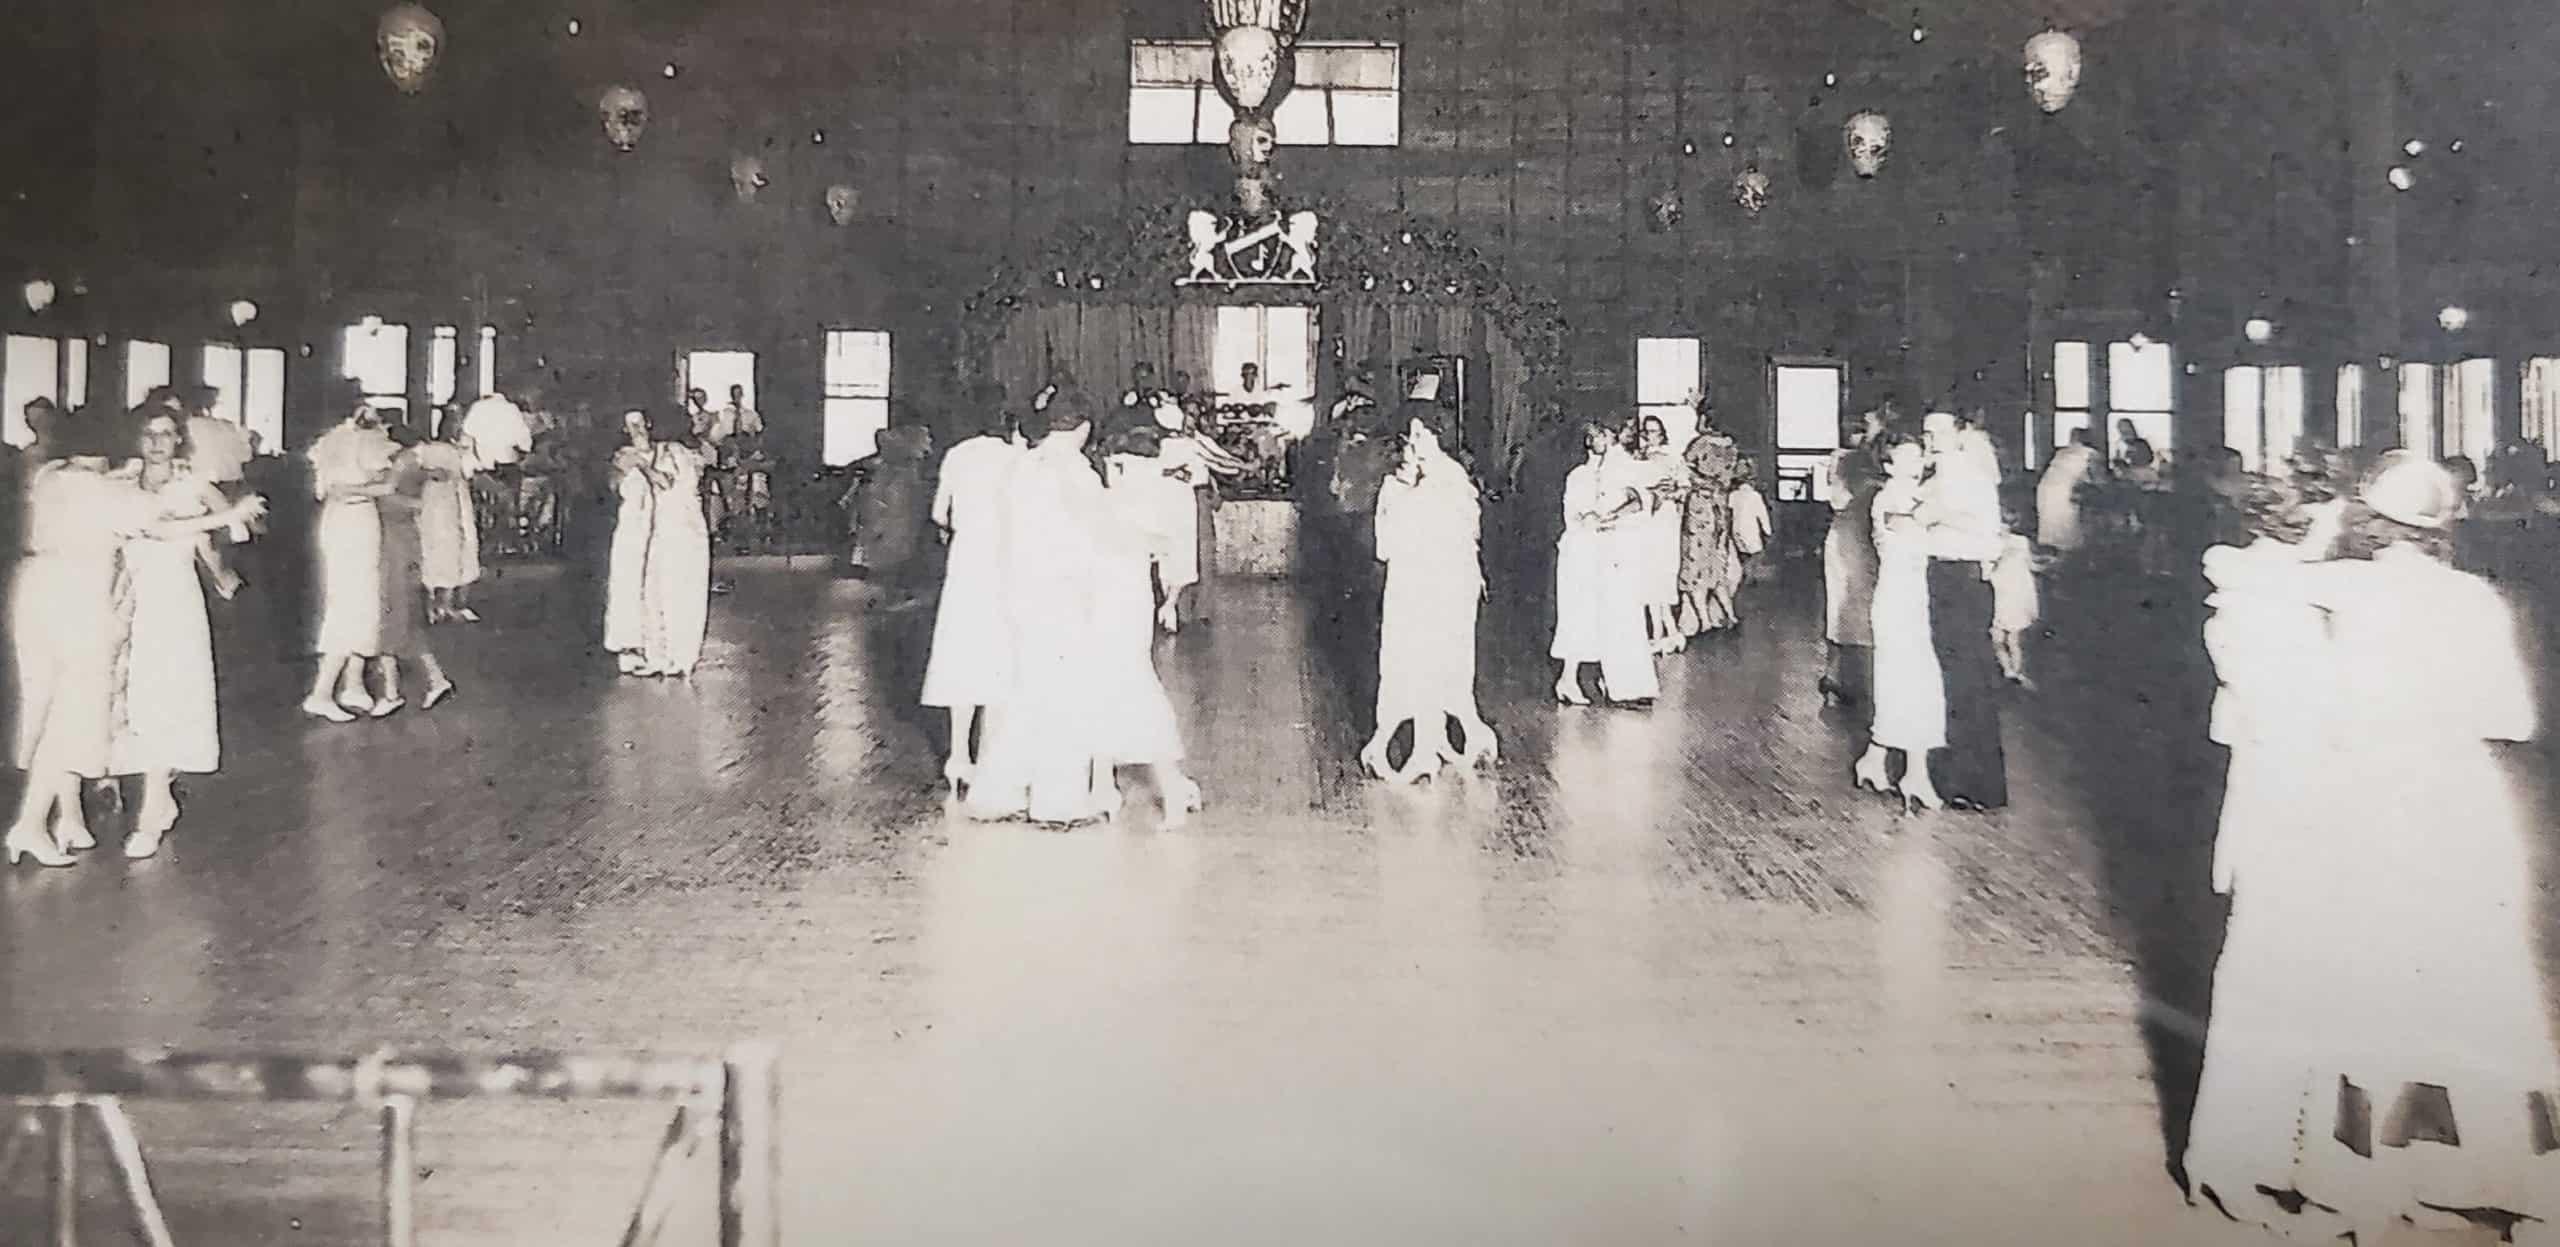 Dance Floor at The Rustic